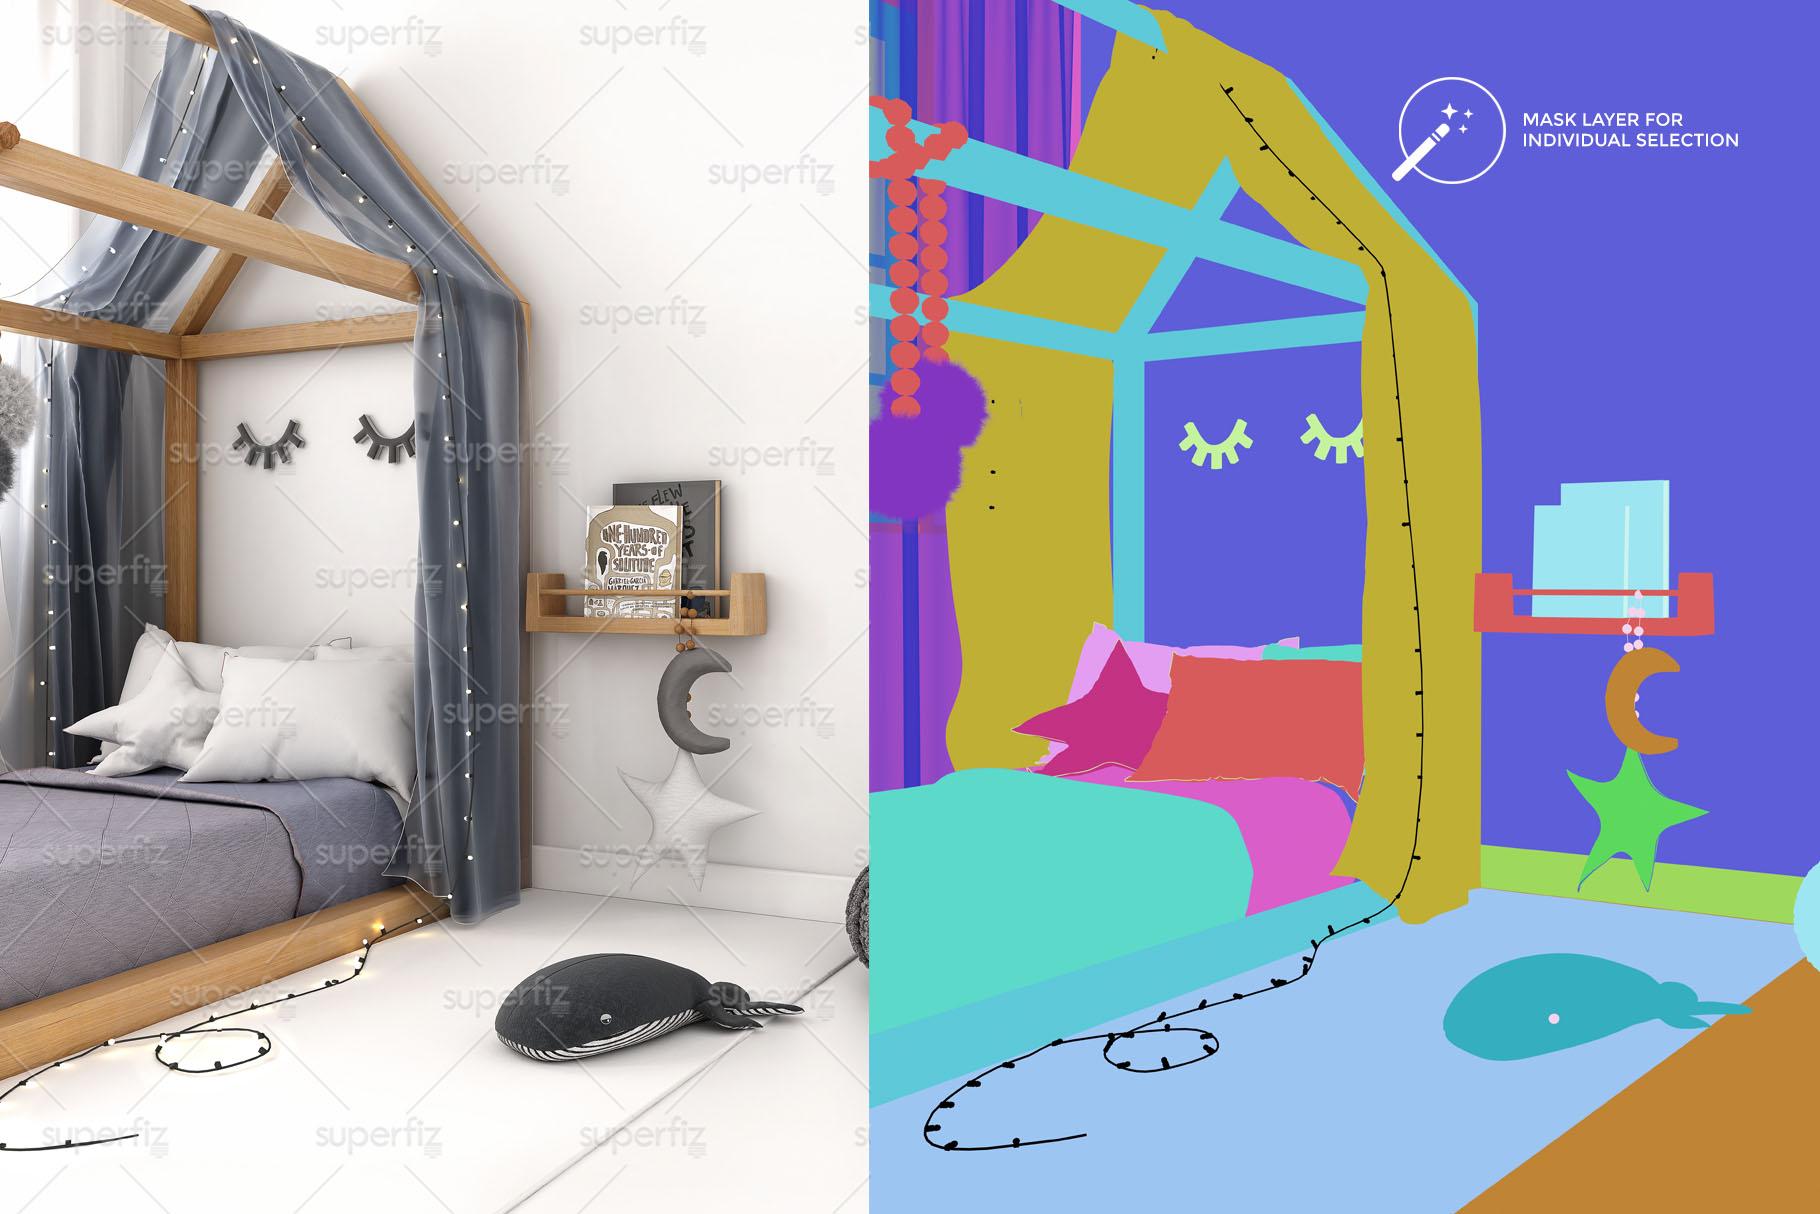 Wallpaper Mockup Kids Bedroom SM59 example image 2